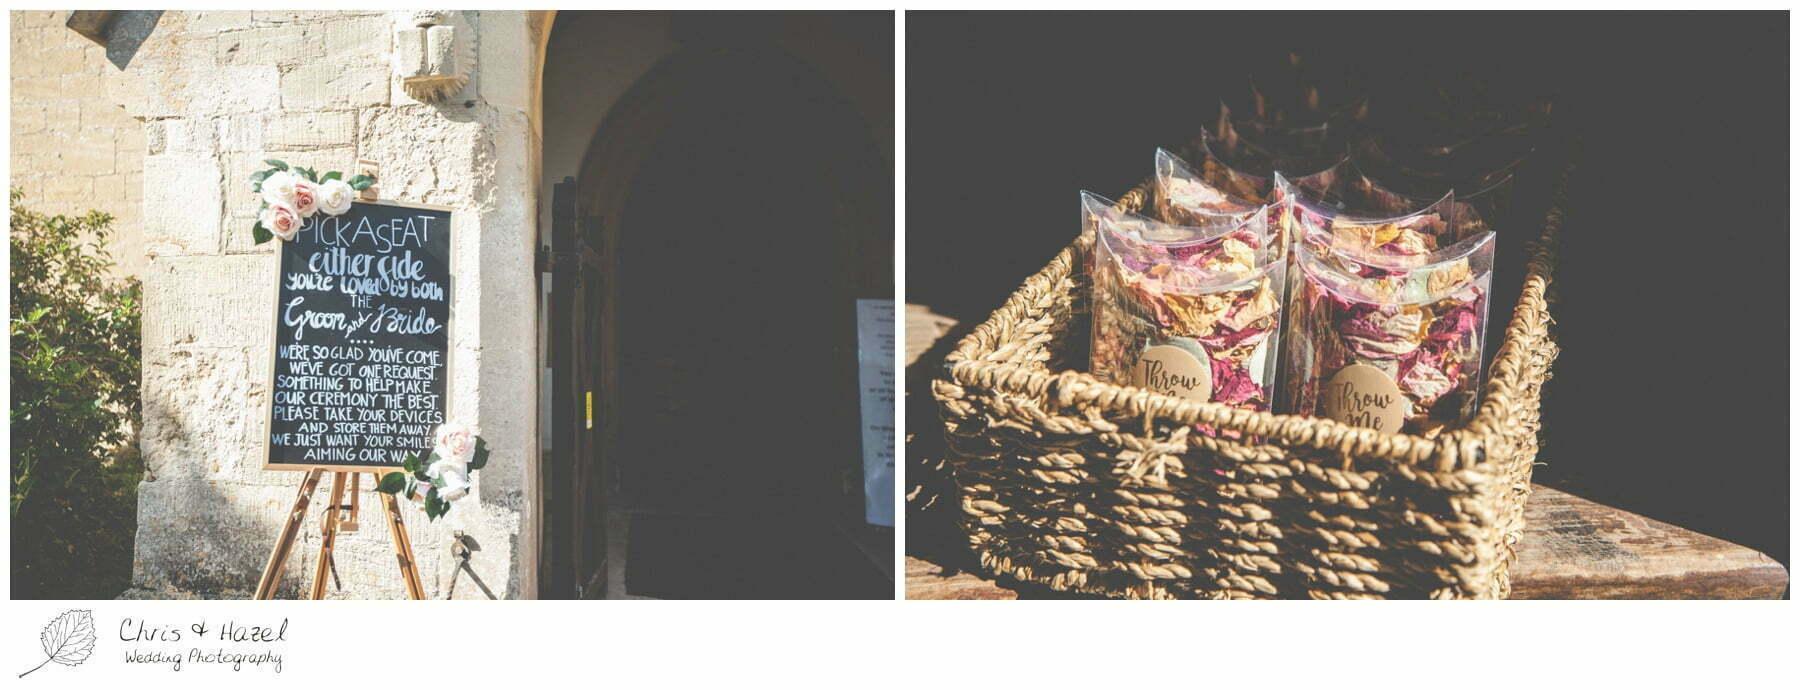 Confetti, Wedding at Hilperton Church, St Michael & All Angels' Church, Wedding Photography, Wiltshire Wedding Photographer Trowbridge, Chris and Hazel Wedding Photography